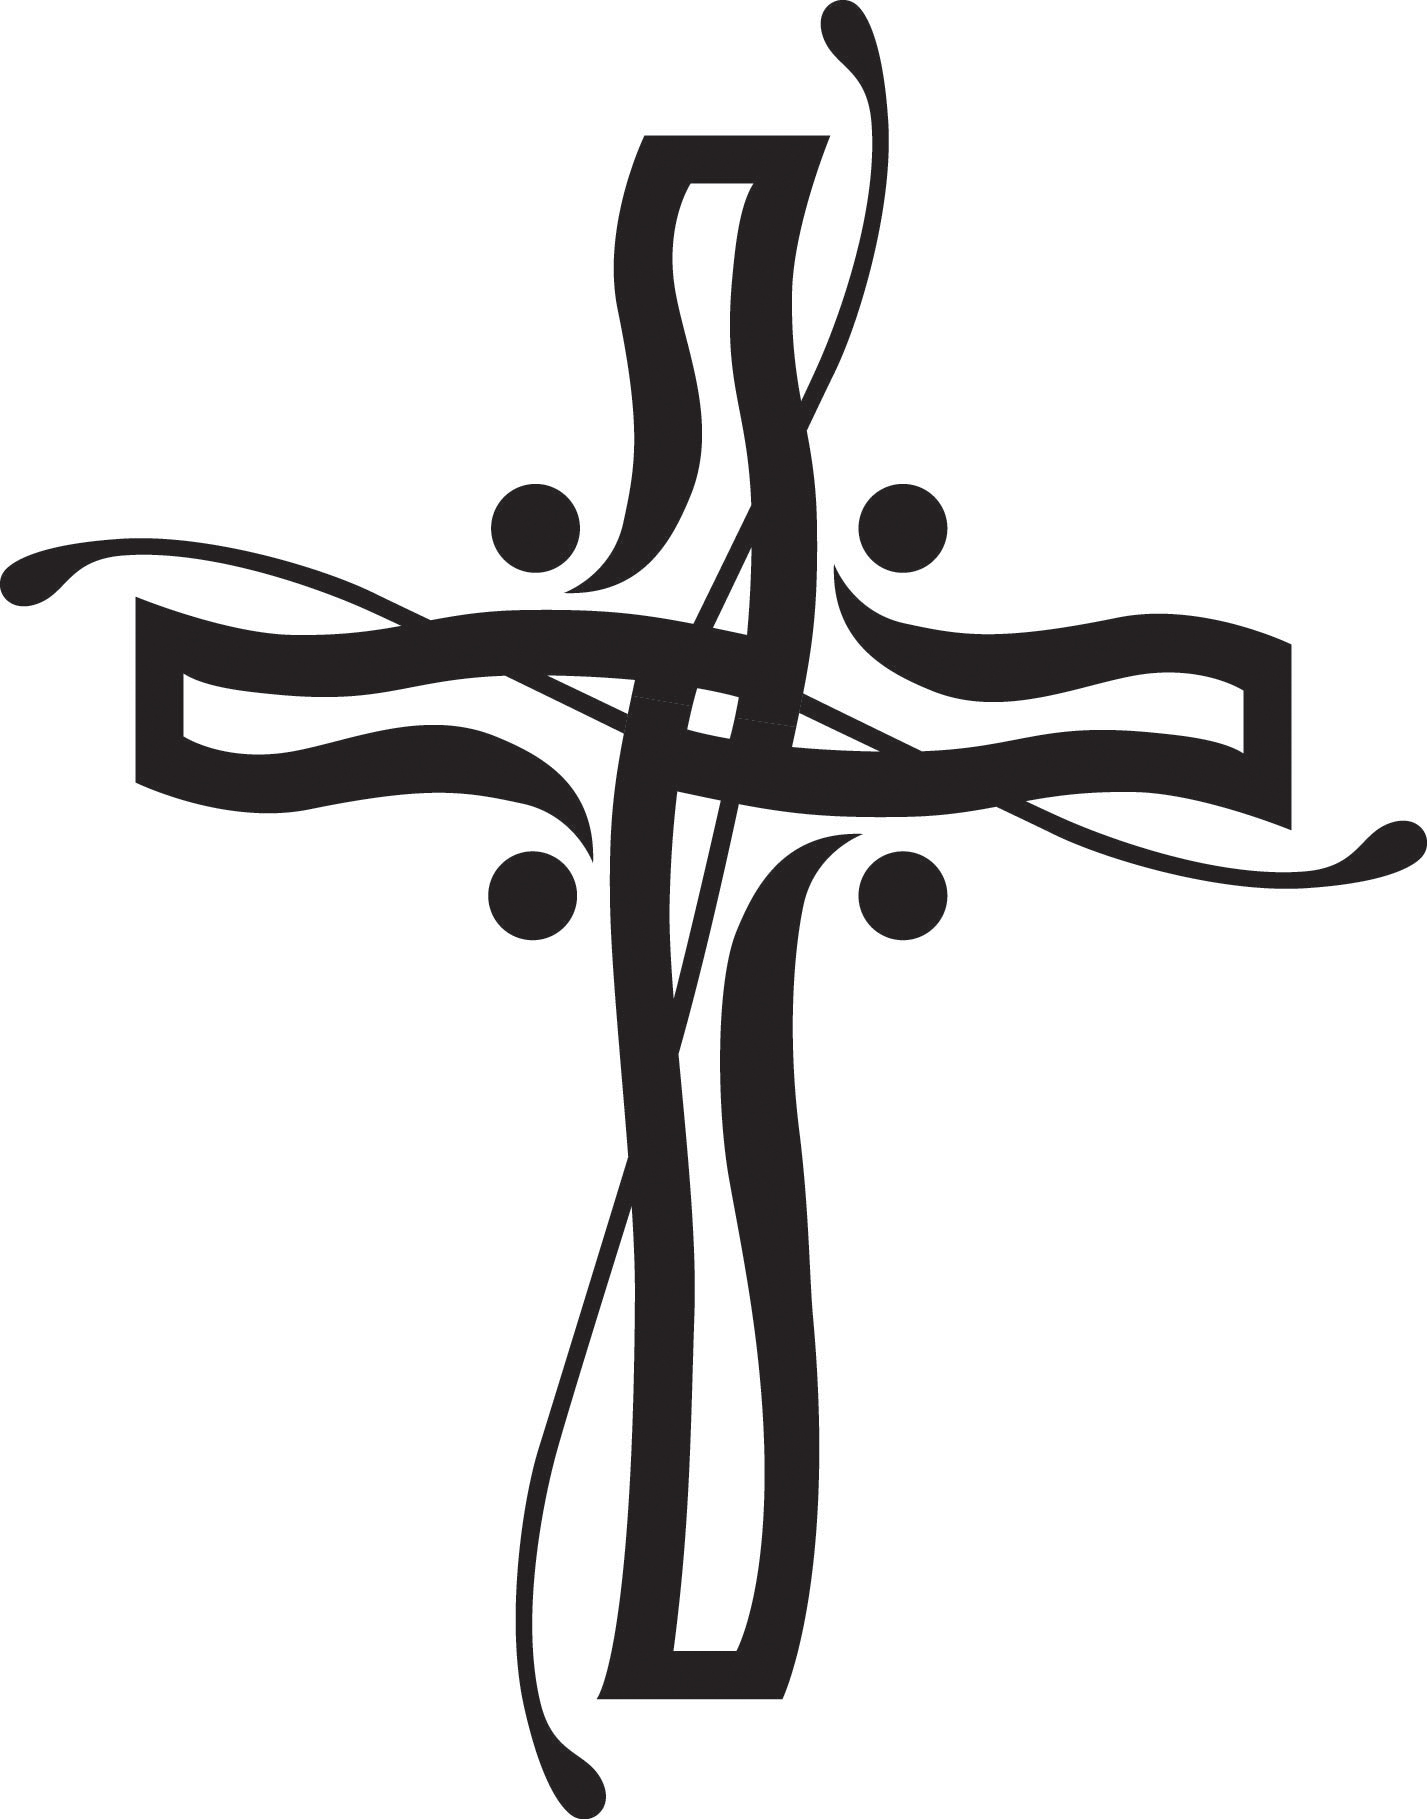 1427x1819 Free Religious Clip Art Borders Cliparts